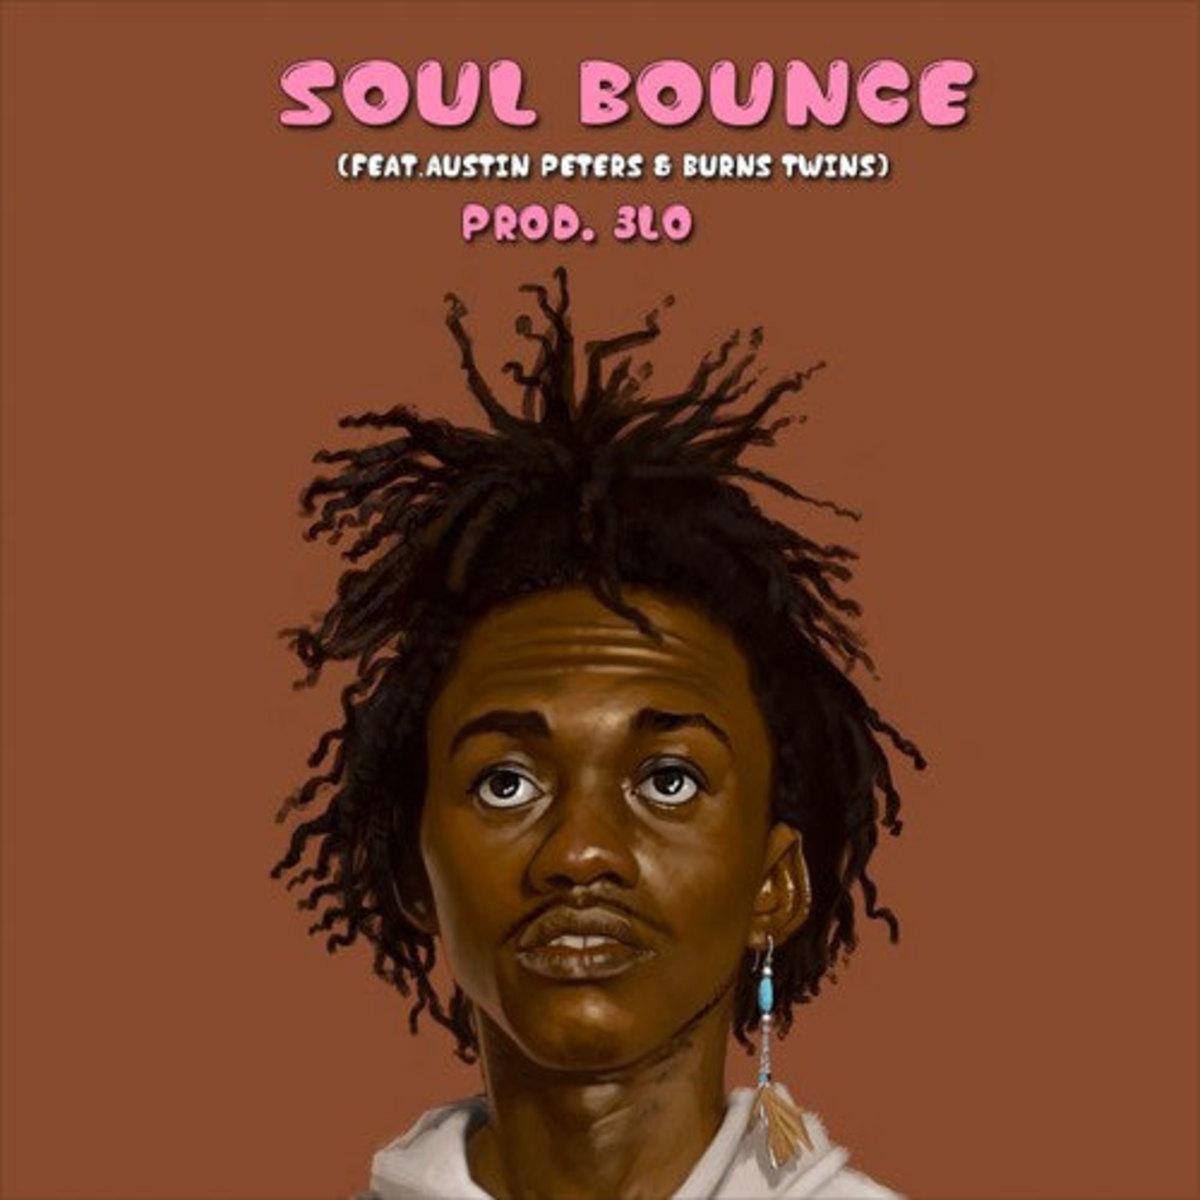 ric-wilson-soul-bounce.jpg